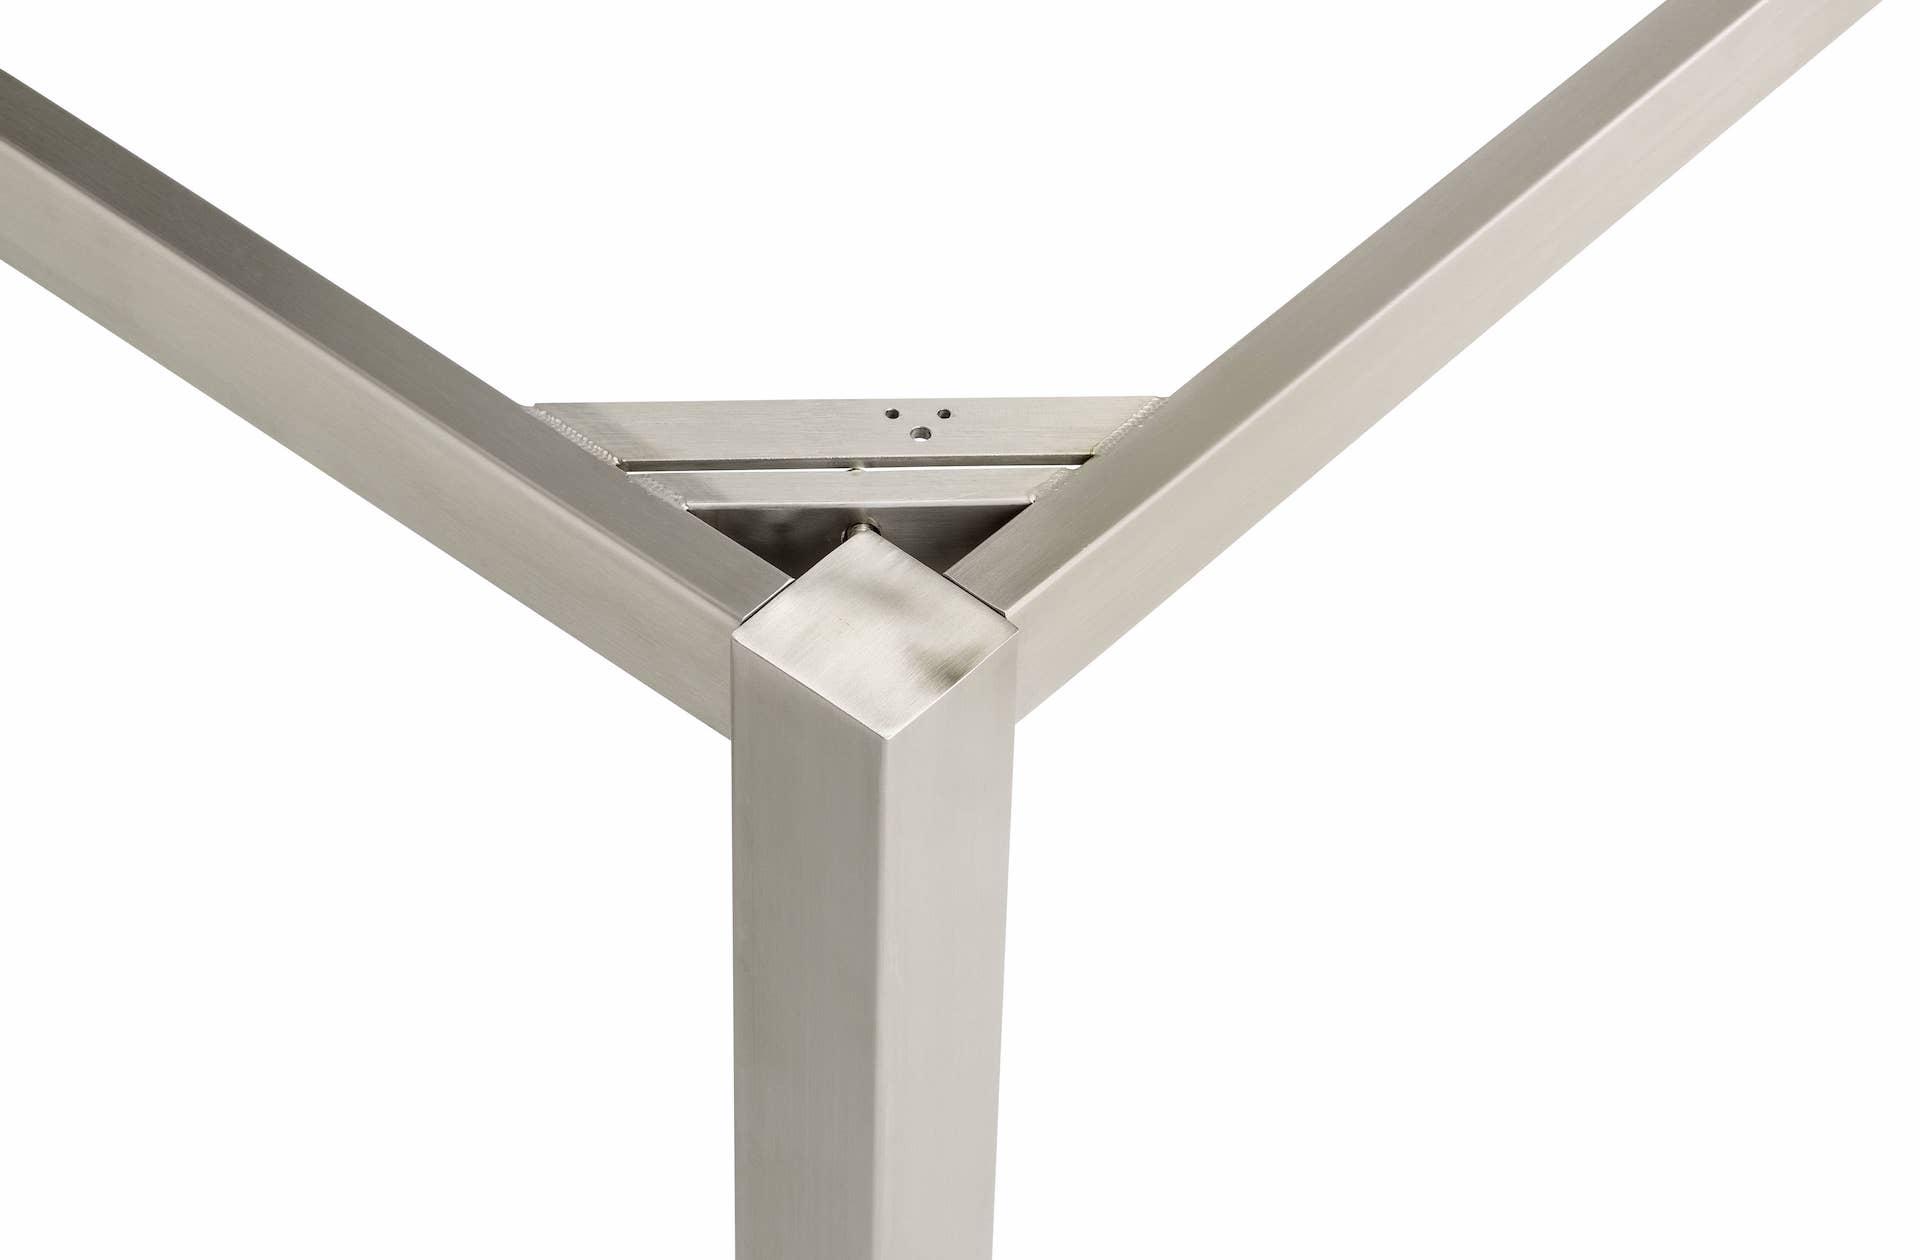 CUBIC Edelstahl Tischgestell 95 x 95 x 72 cm